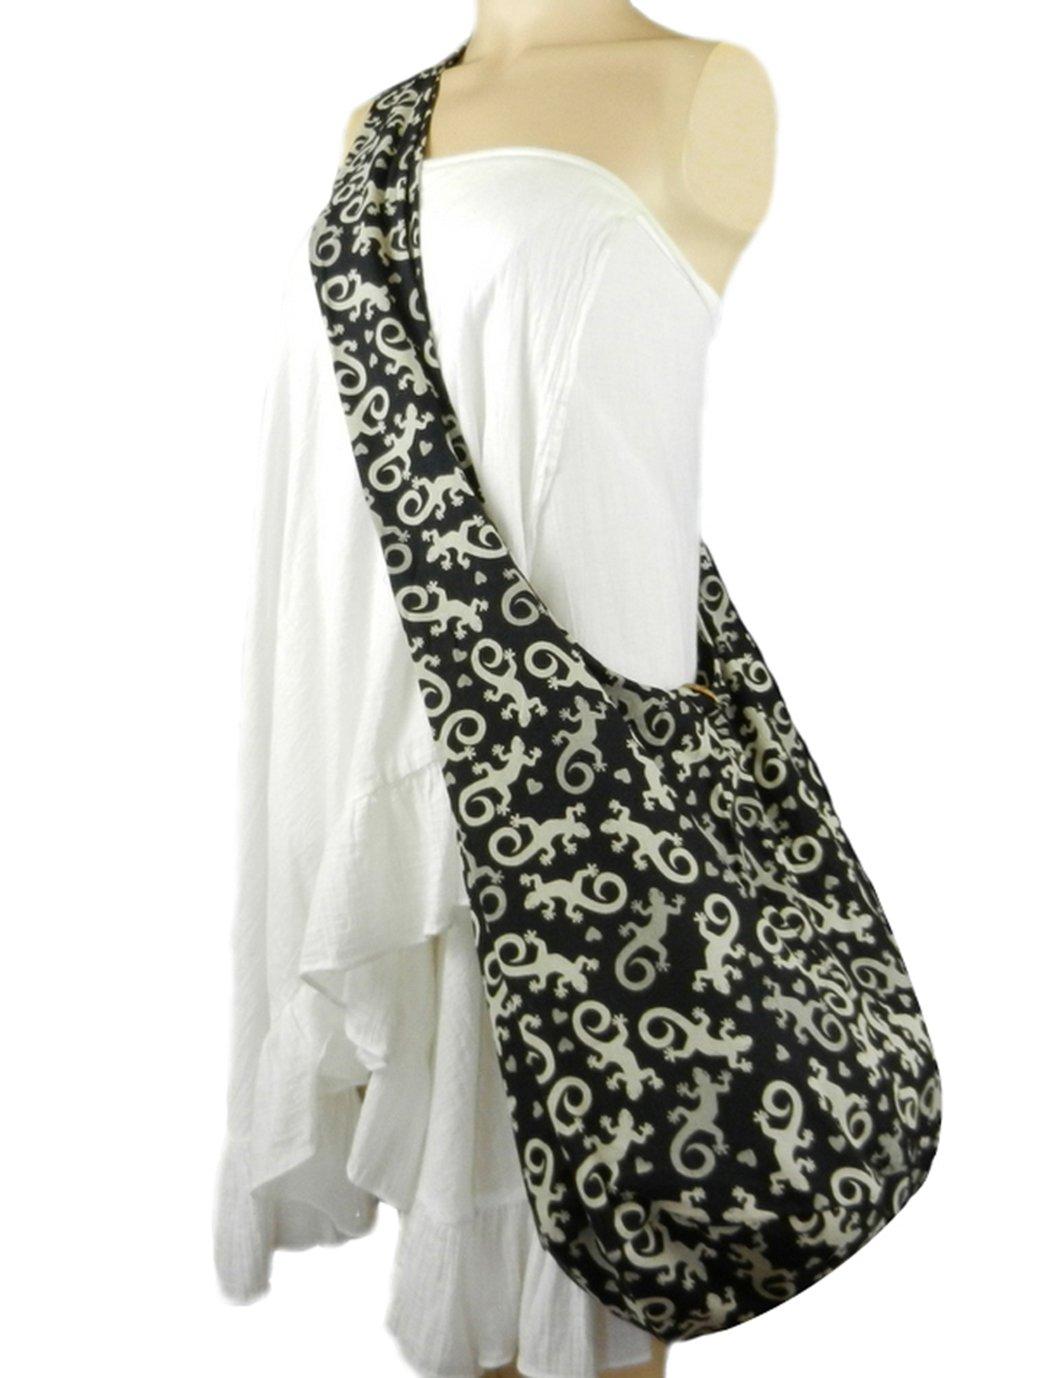 BTP! Gecko Hippie Hobo Thai Cotton Sling Crossbody Bag Messenger Shoulder Purse (Black GC1)